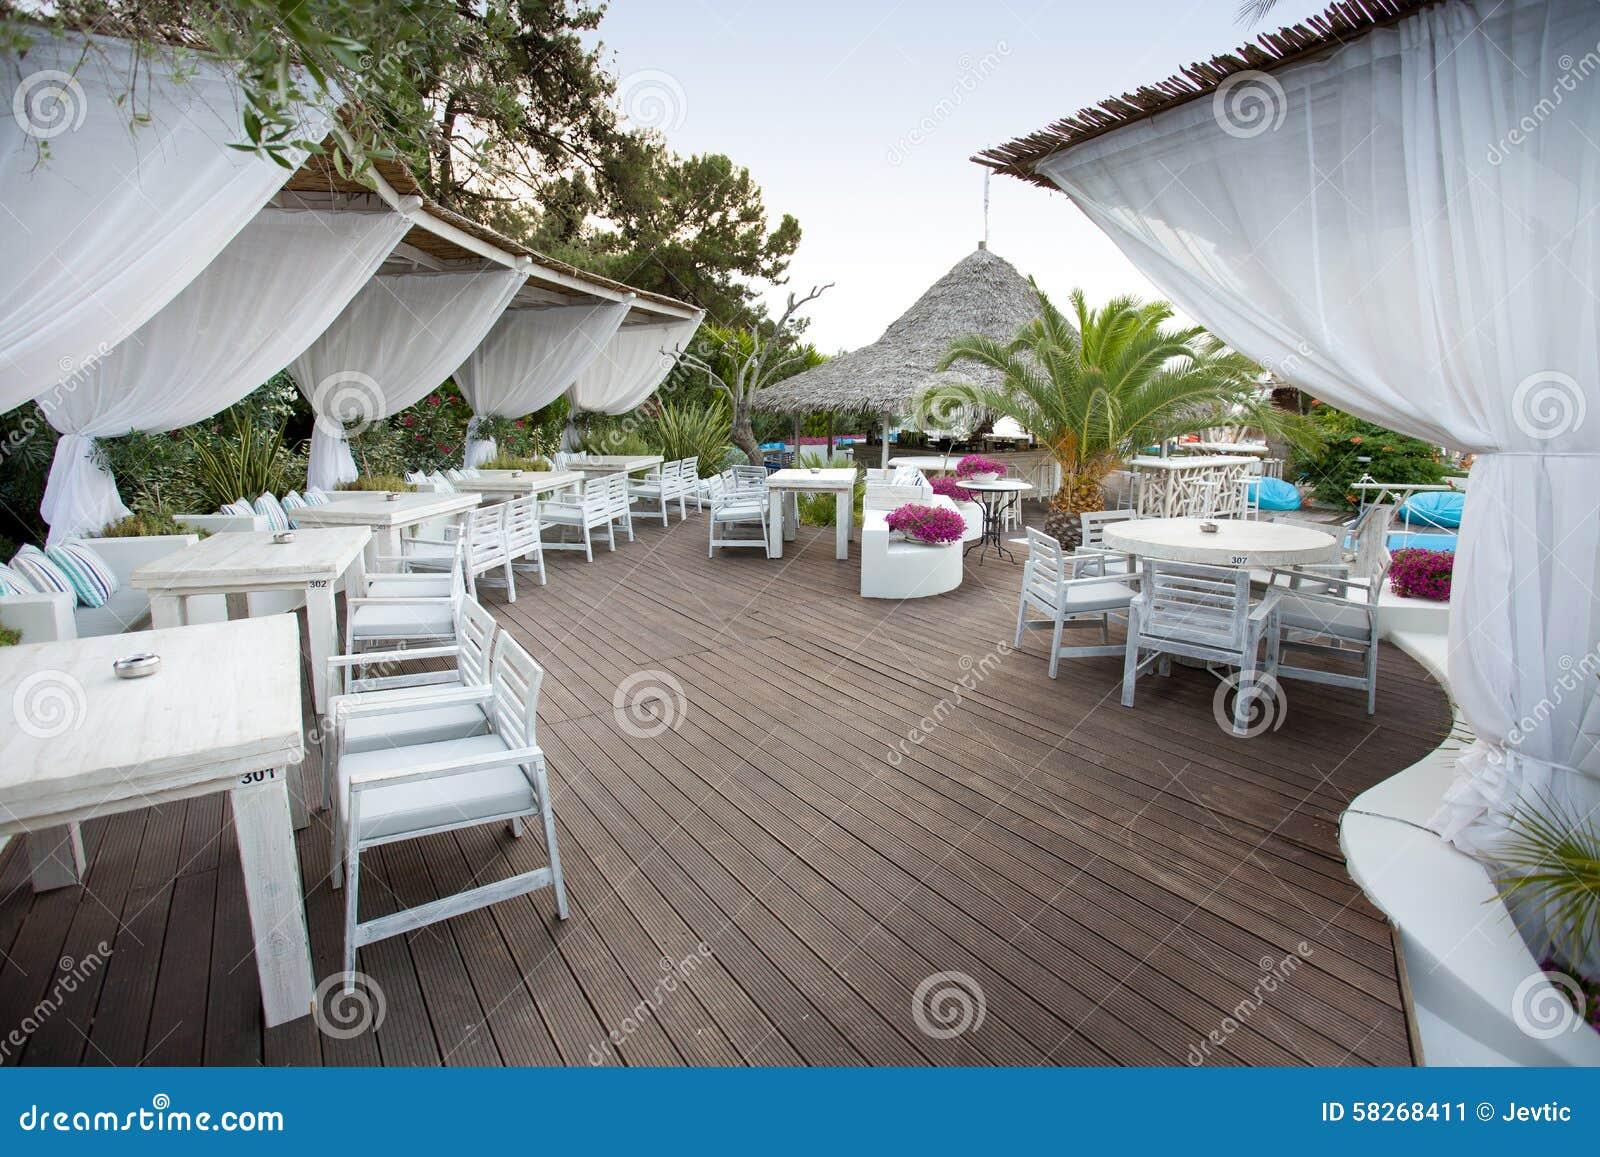 Luxury Bar At Beach Stock Photo Image 58268411